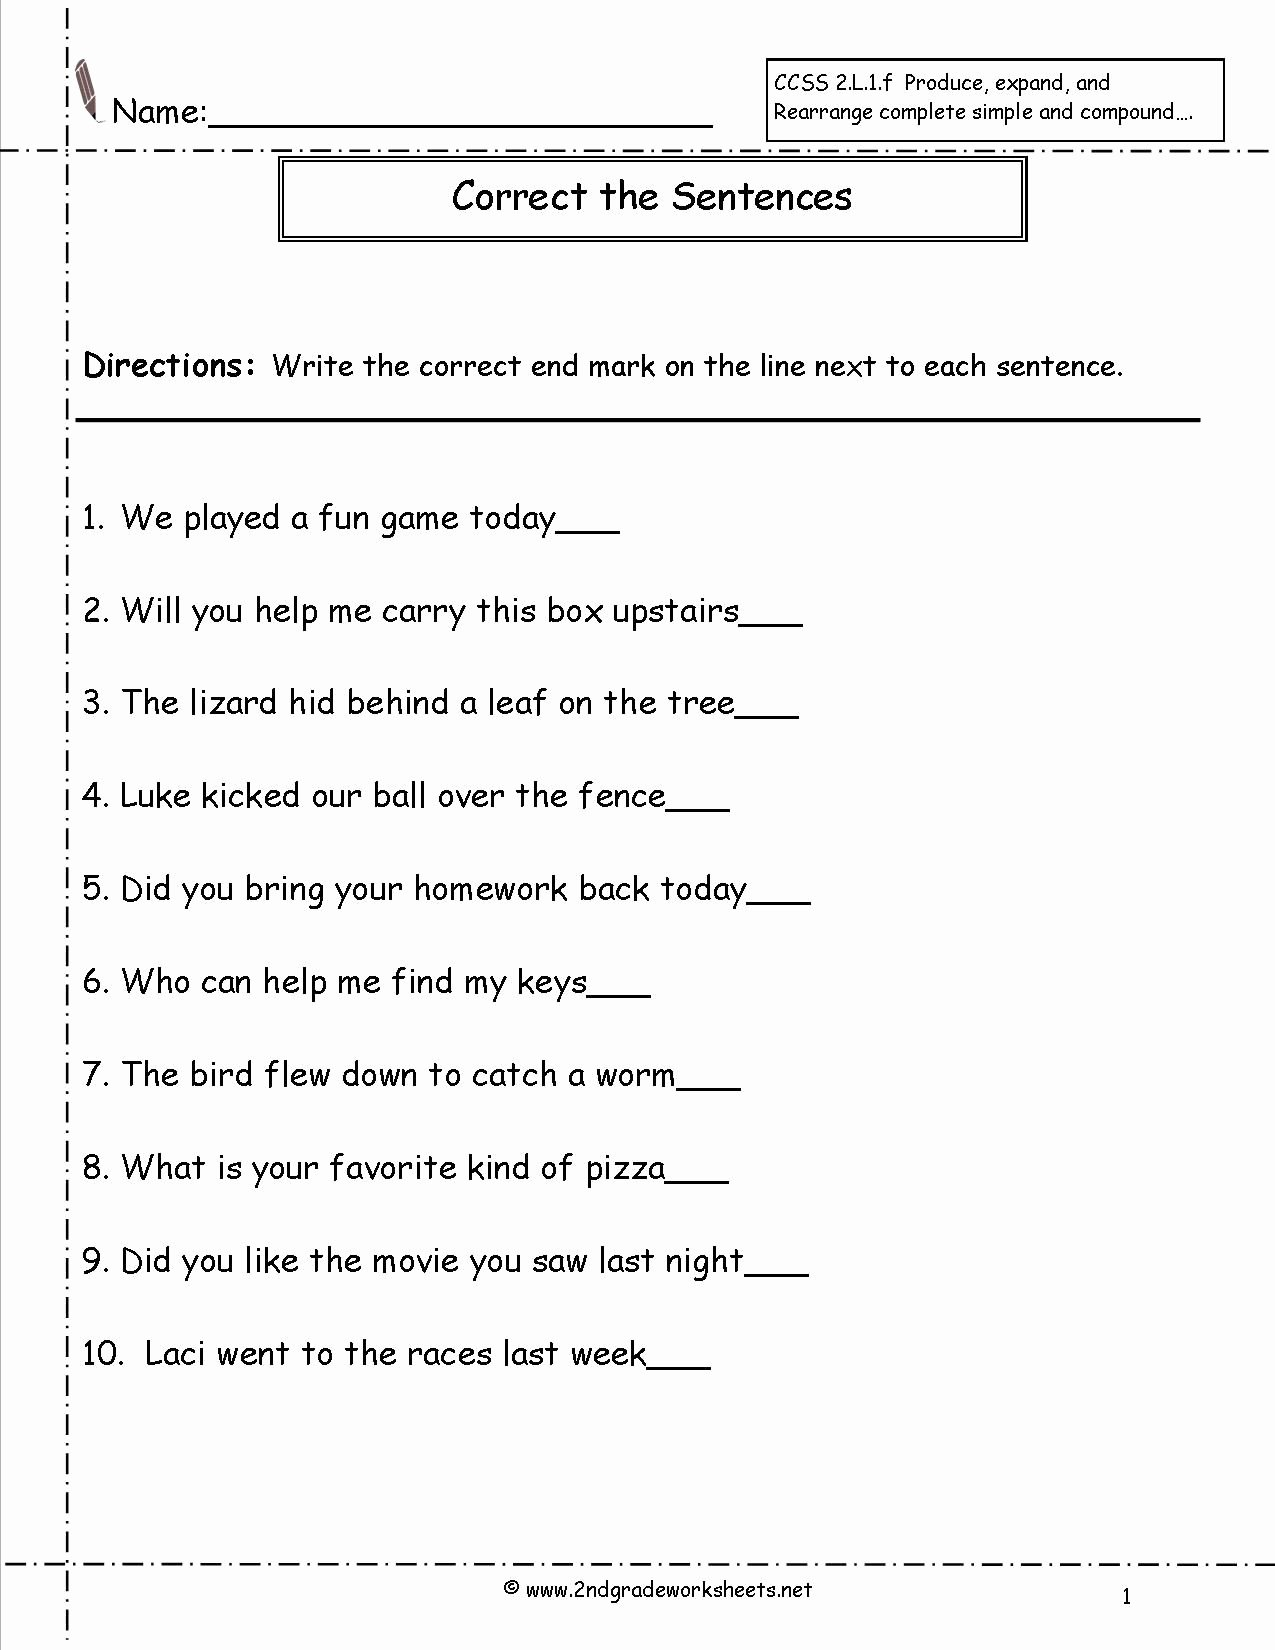 Context Clues Worksheets Second Grade Fresh Second Grade Sentences Worksheets Ccss 2 L 1 F Worksheets